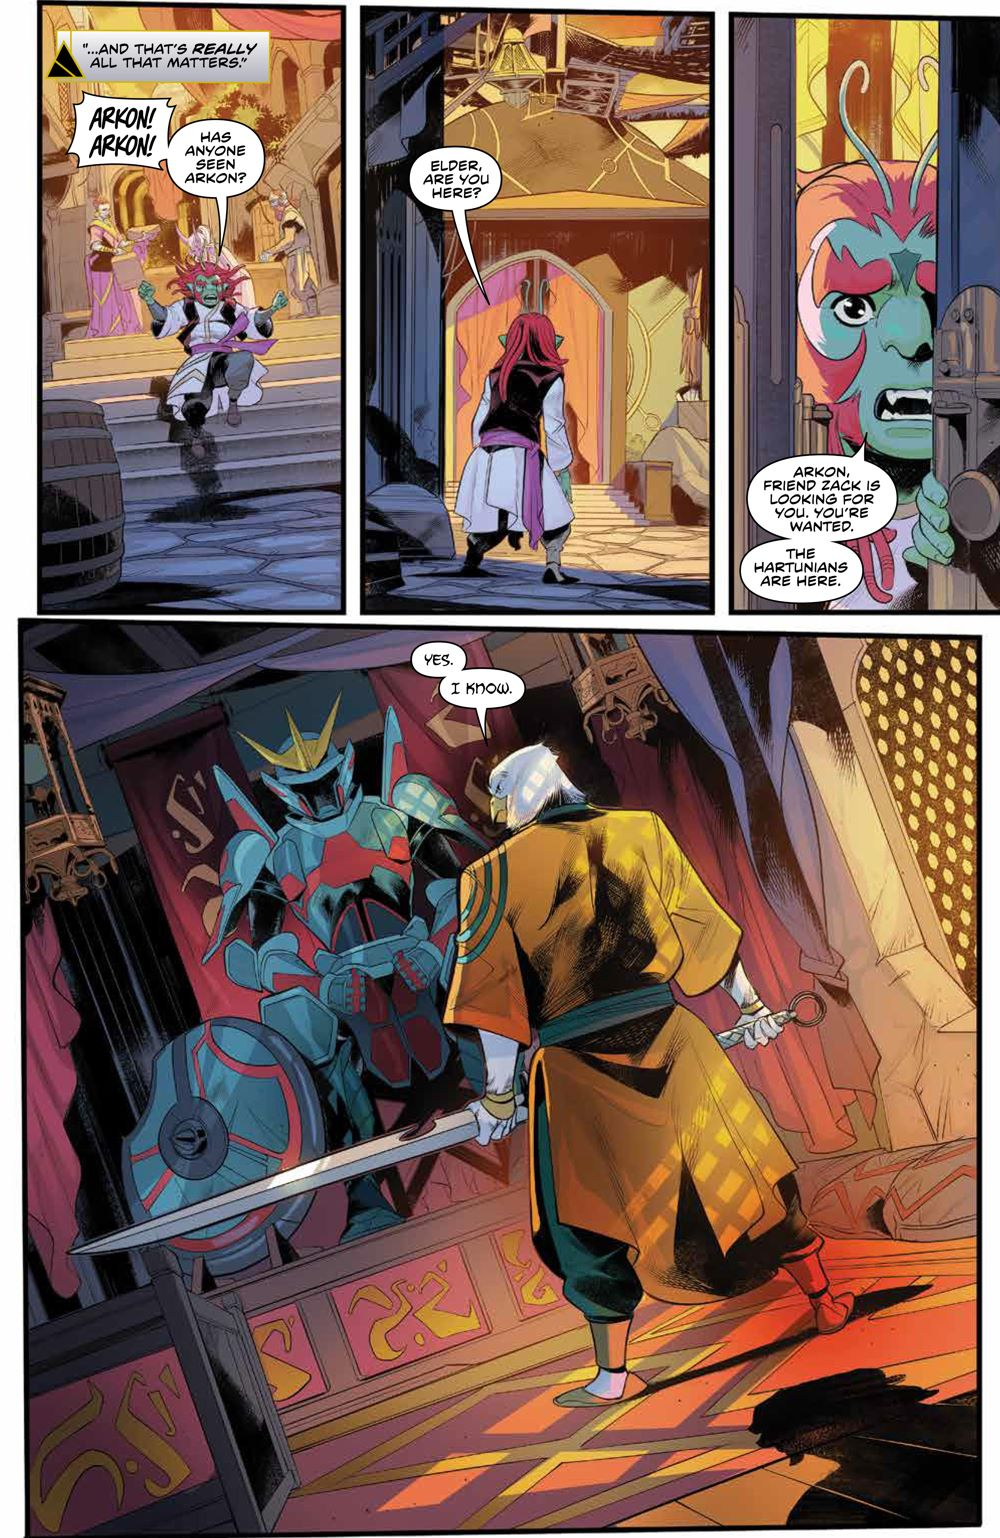 PowerRangers_009_PRESS_5 ComicList Previews: POWER RANGERS #9